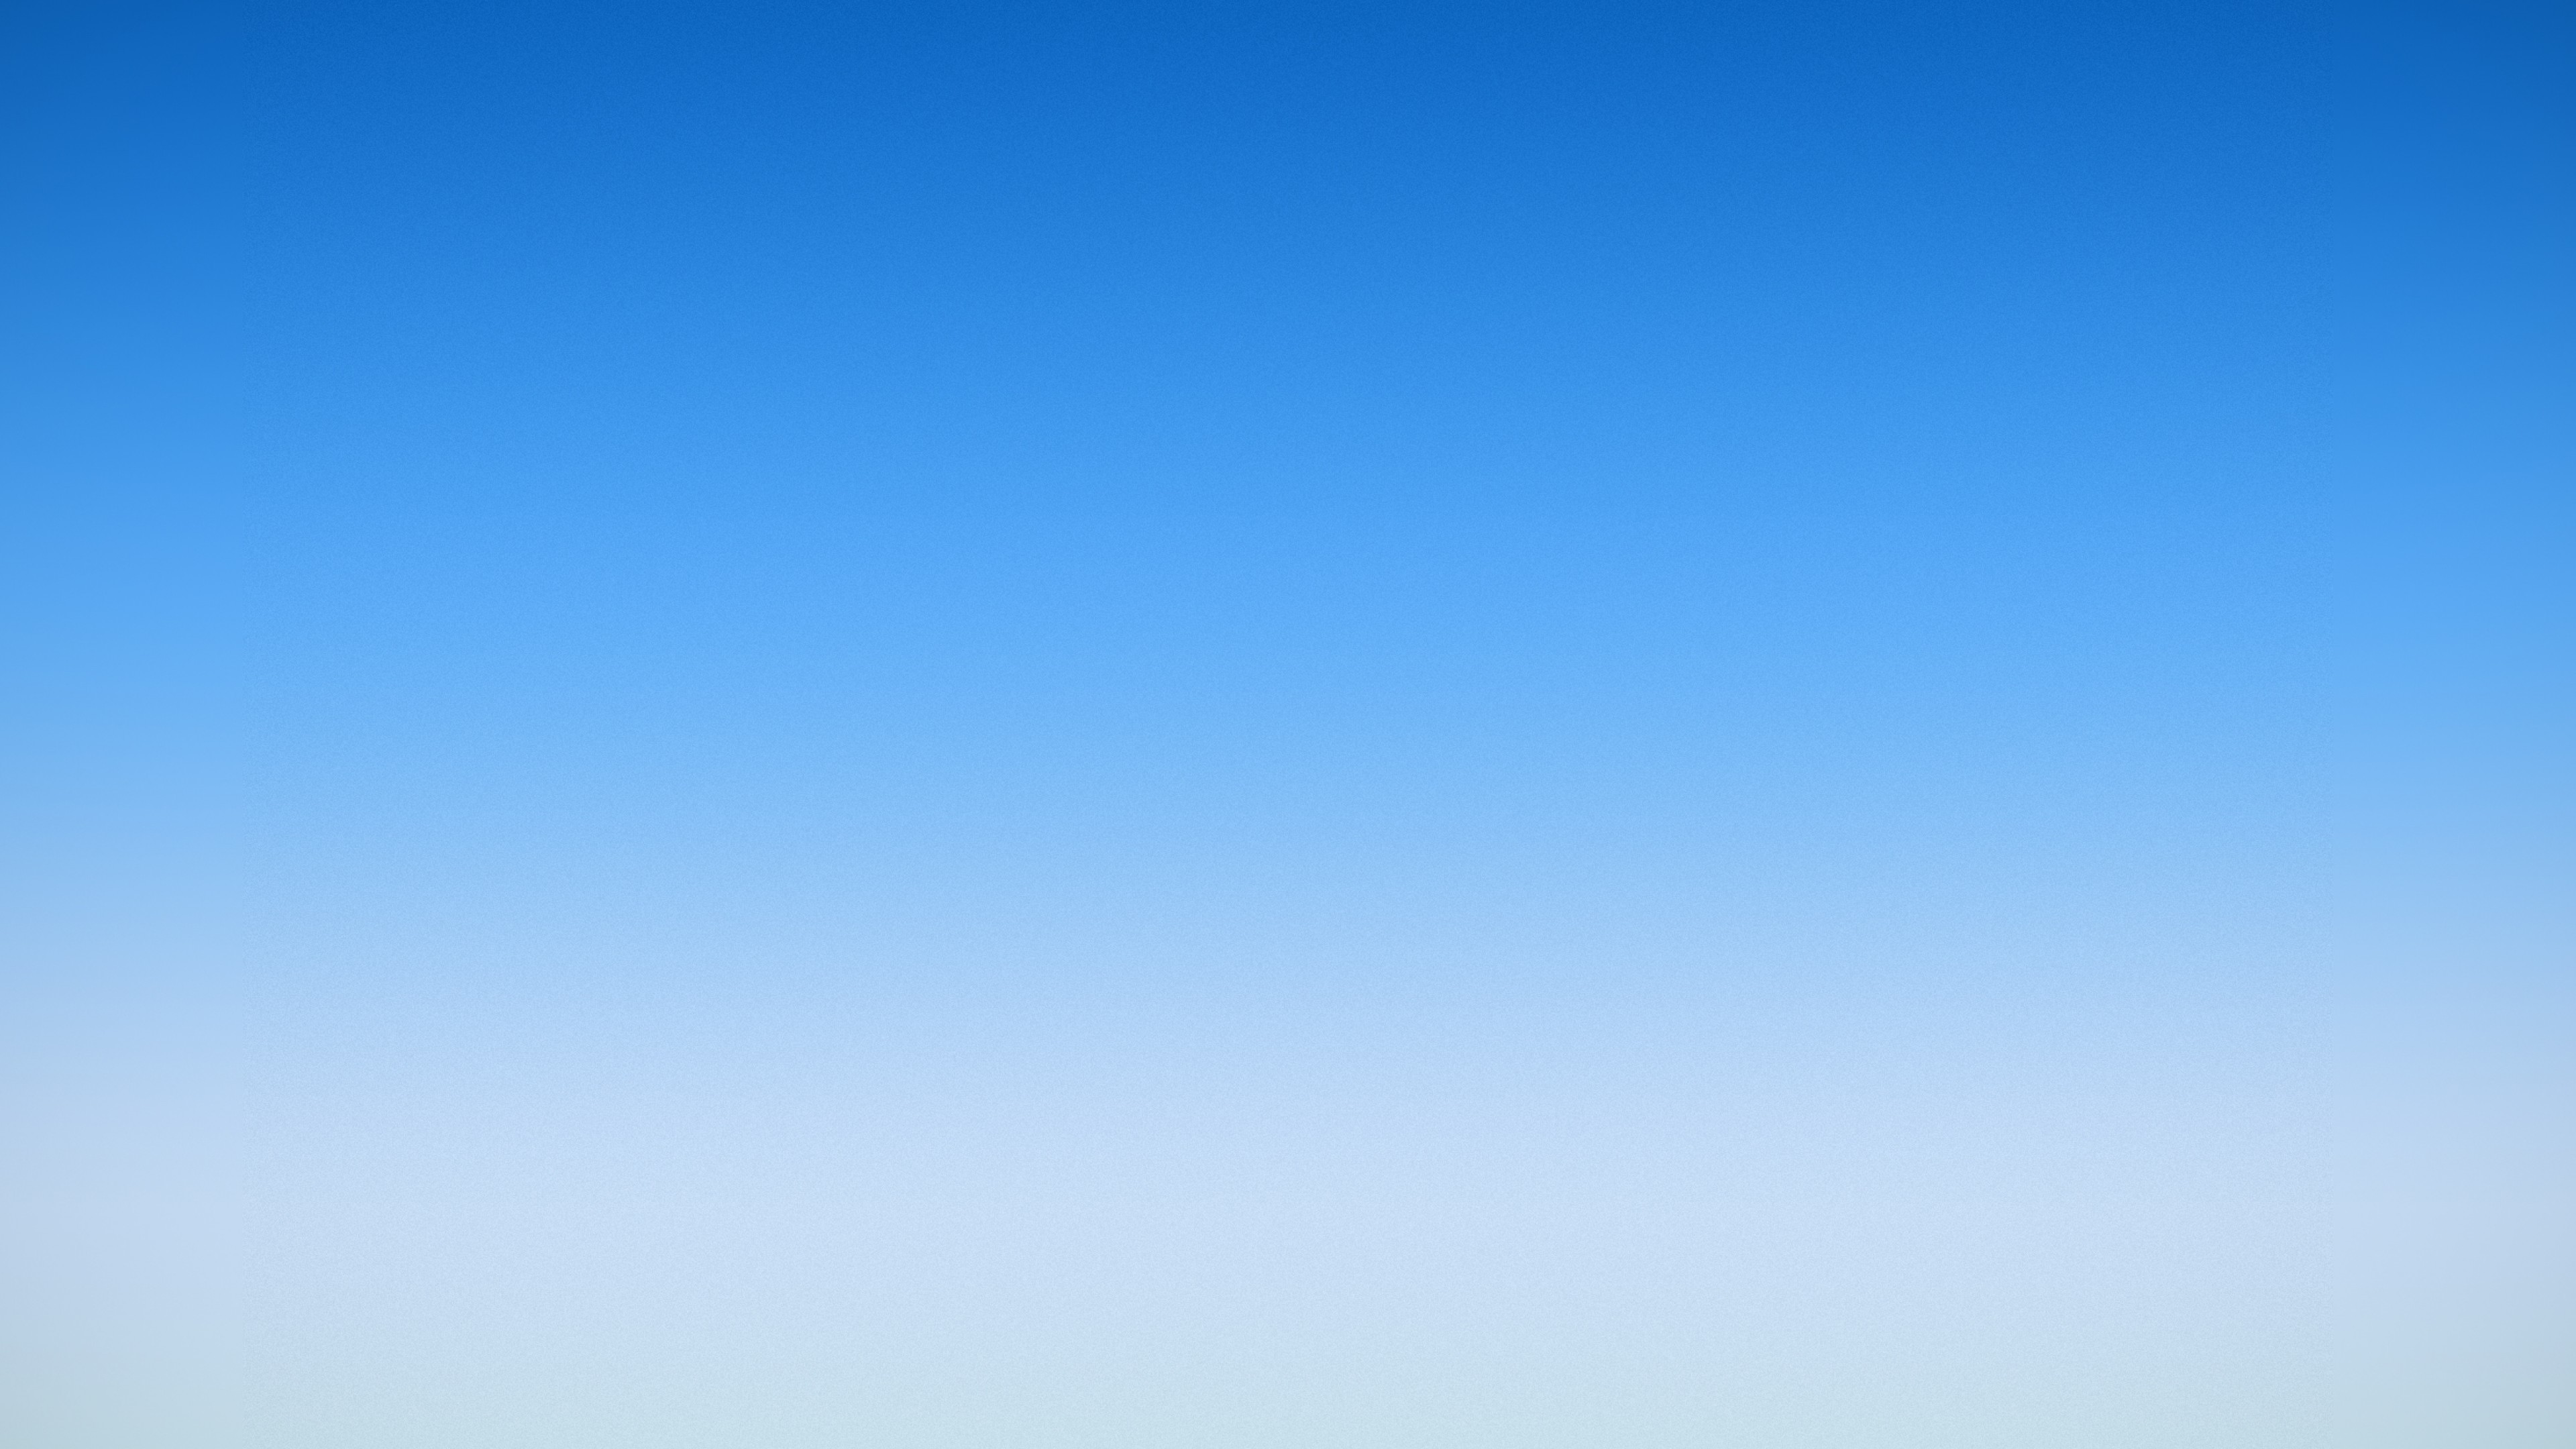 Res: 3840x2160, Minimal / Blue Wallpaper